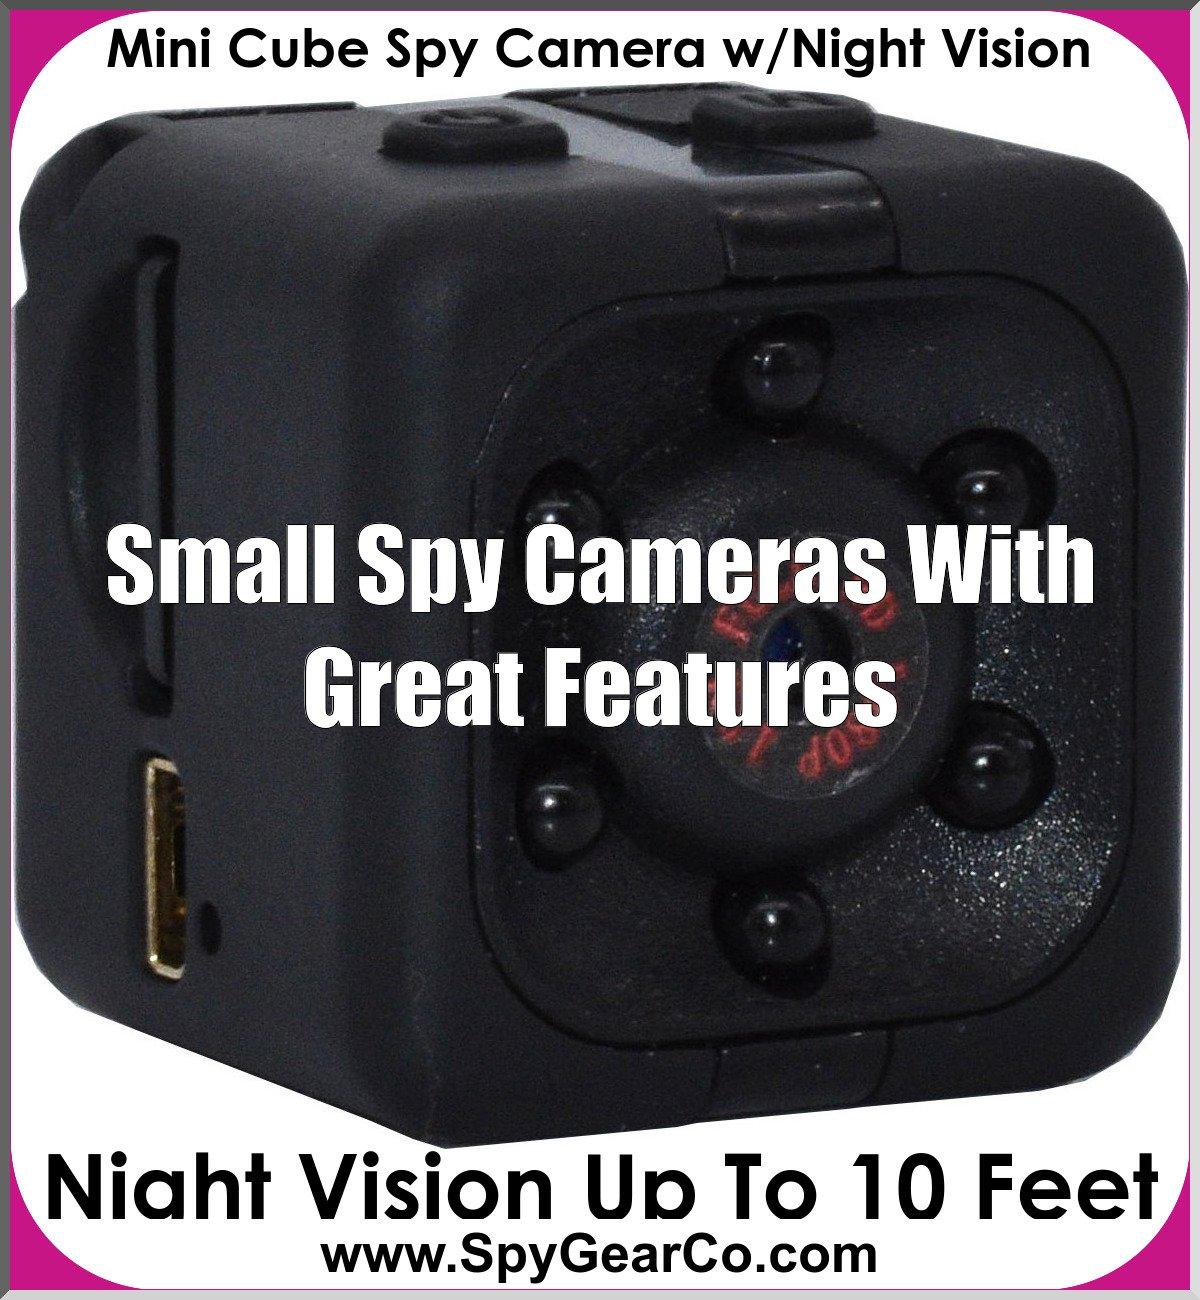 Mini Cube Spy Camera w/Night Vision